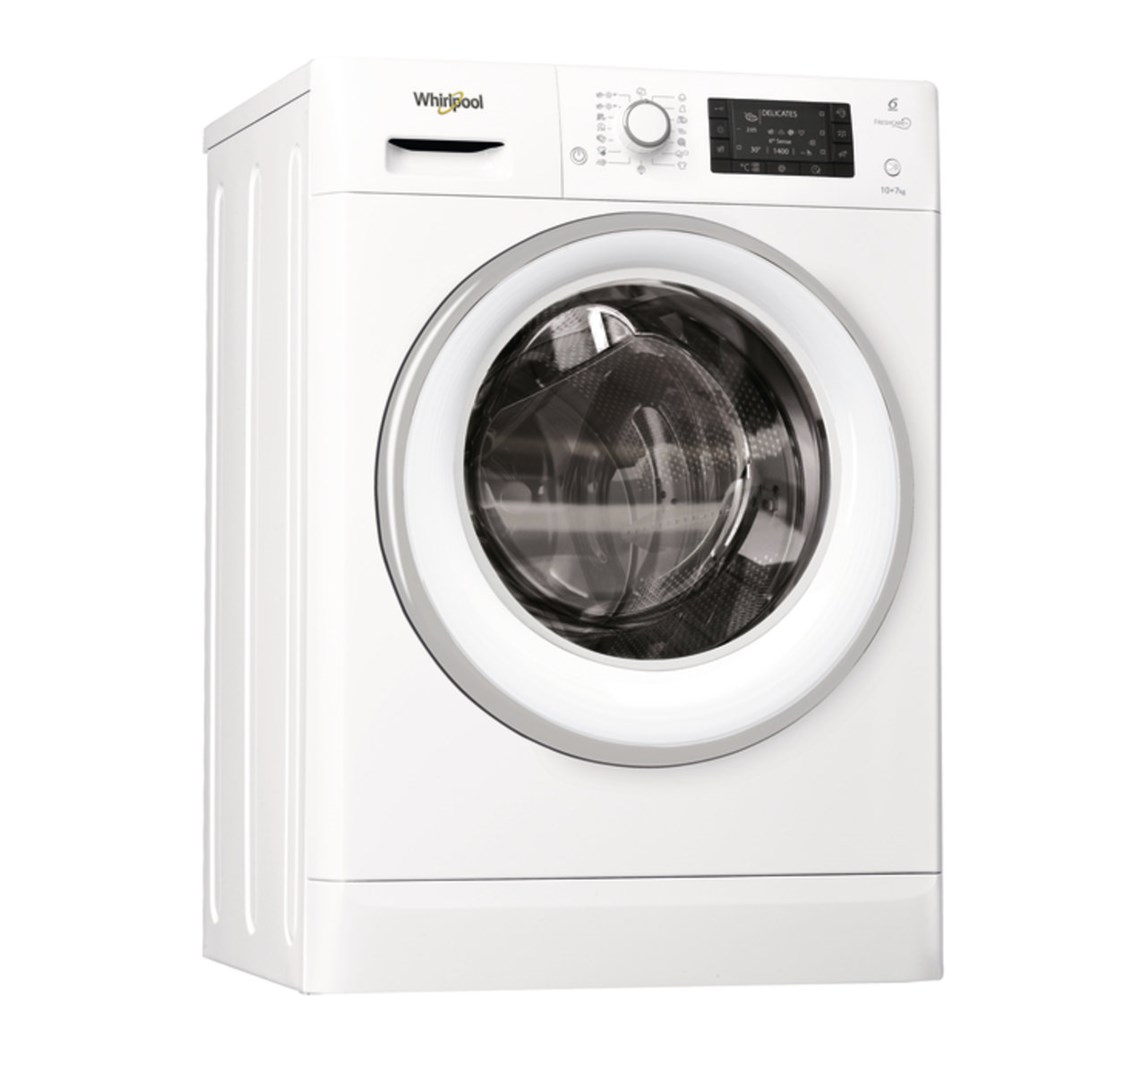 WHIRLPOOL FWDD1071681WS EU pračka se sušičkou